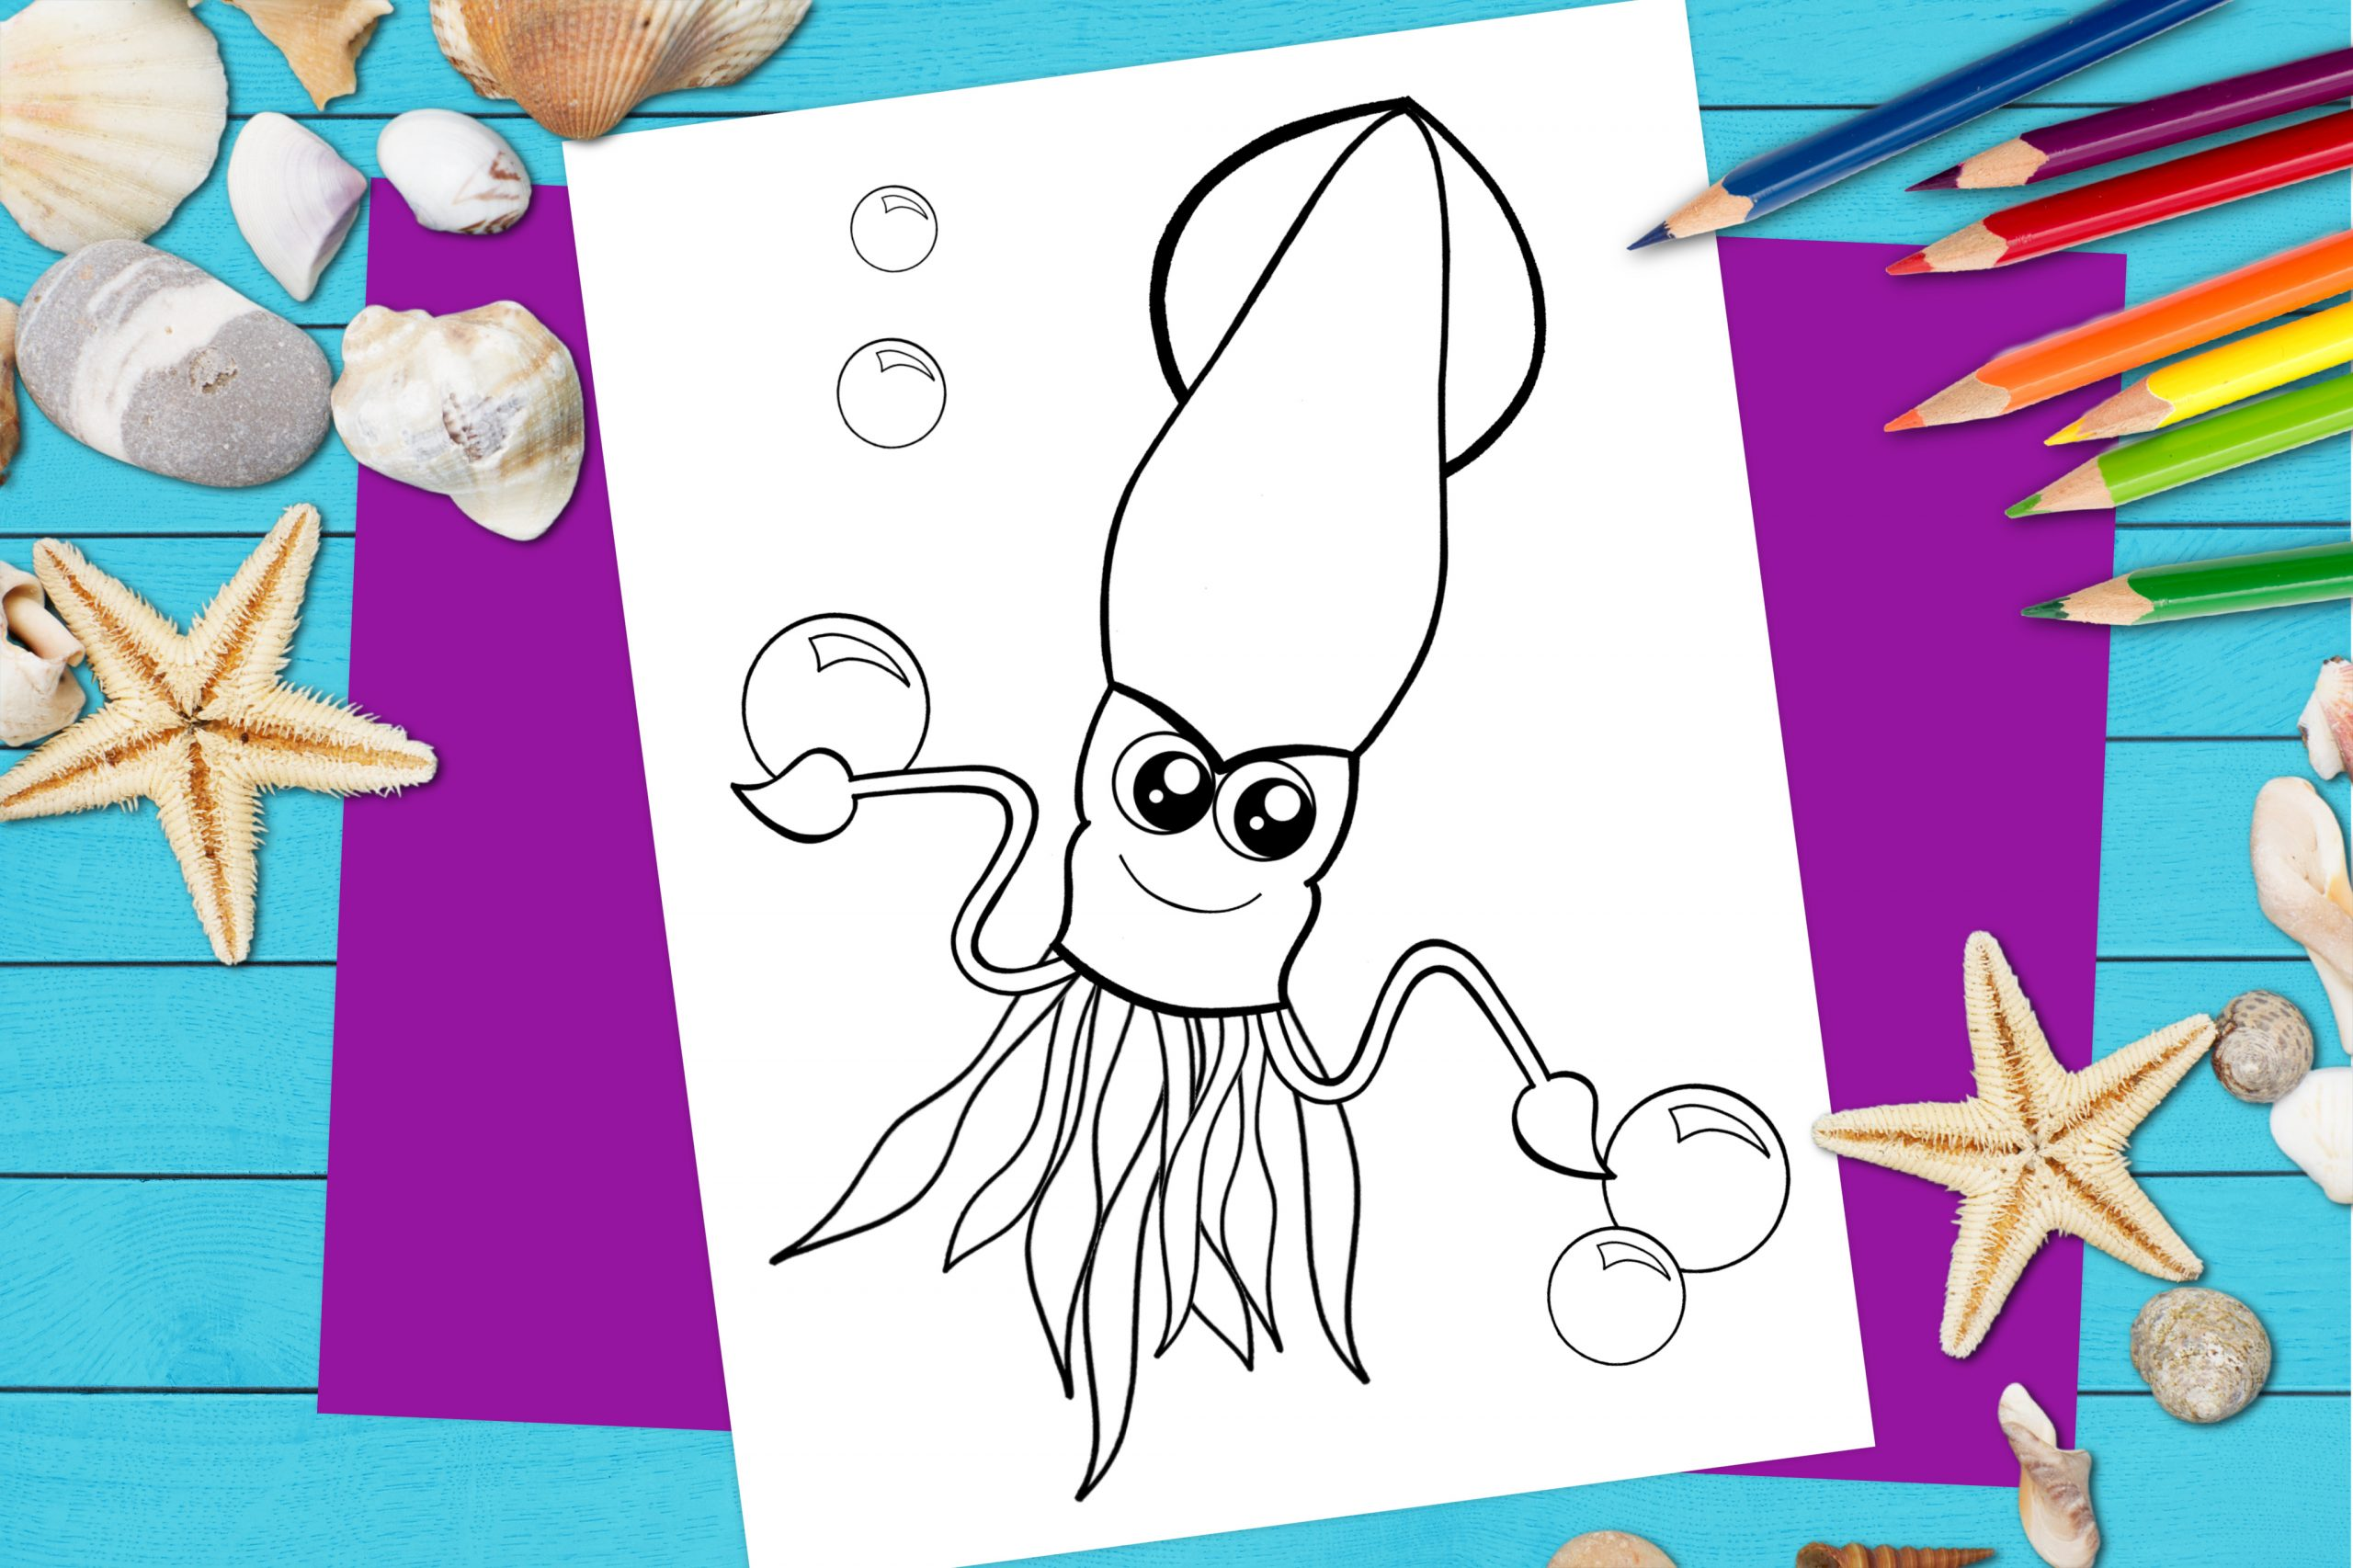 Free Printable Squid Ocean Animal Coloring Page for kids